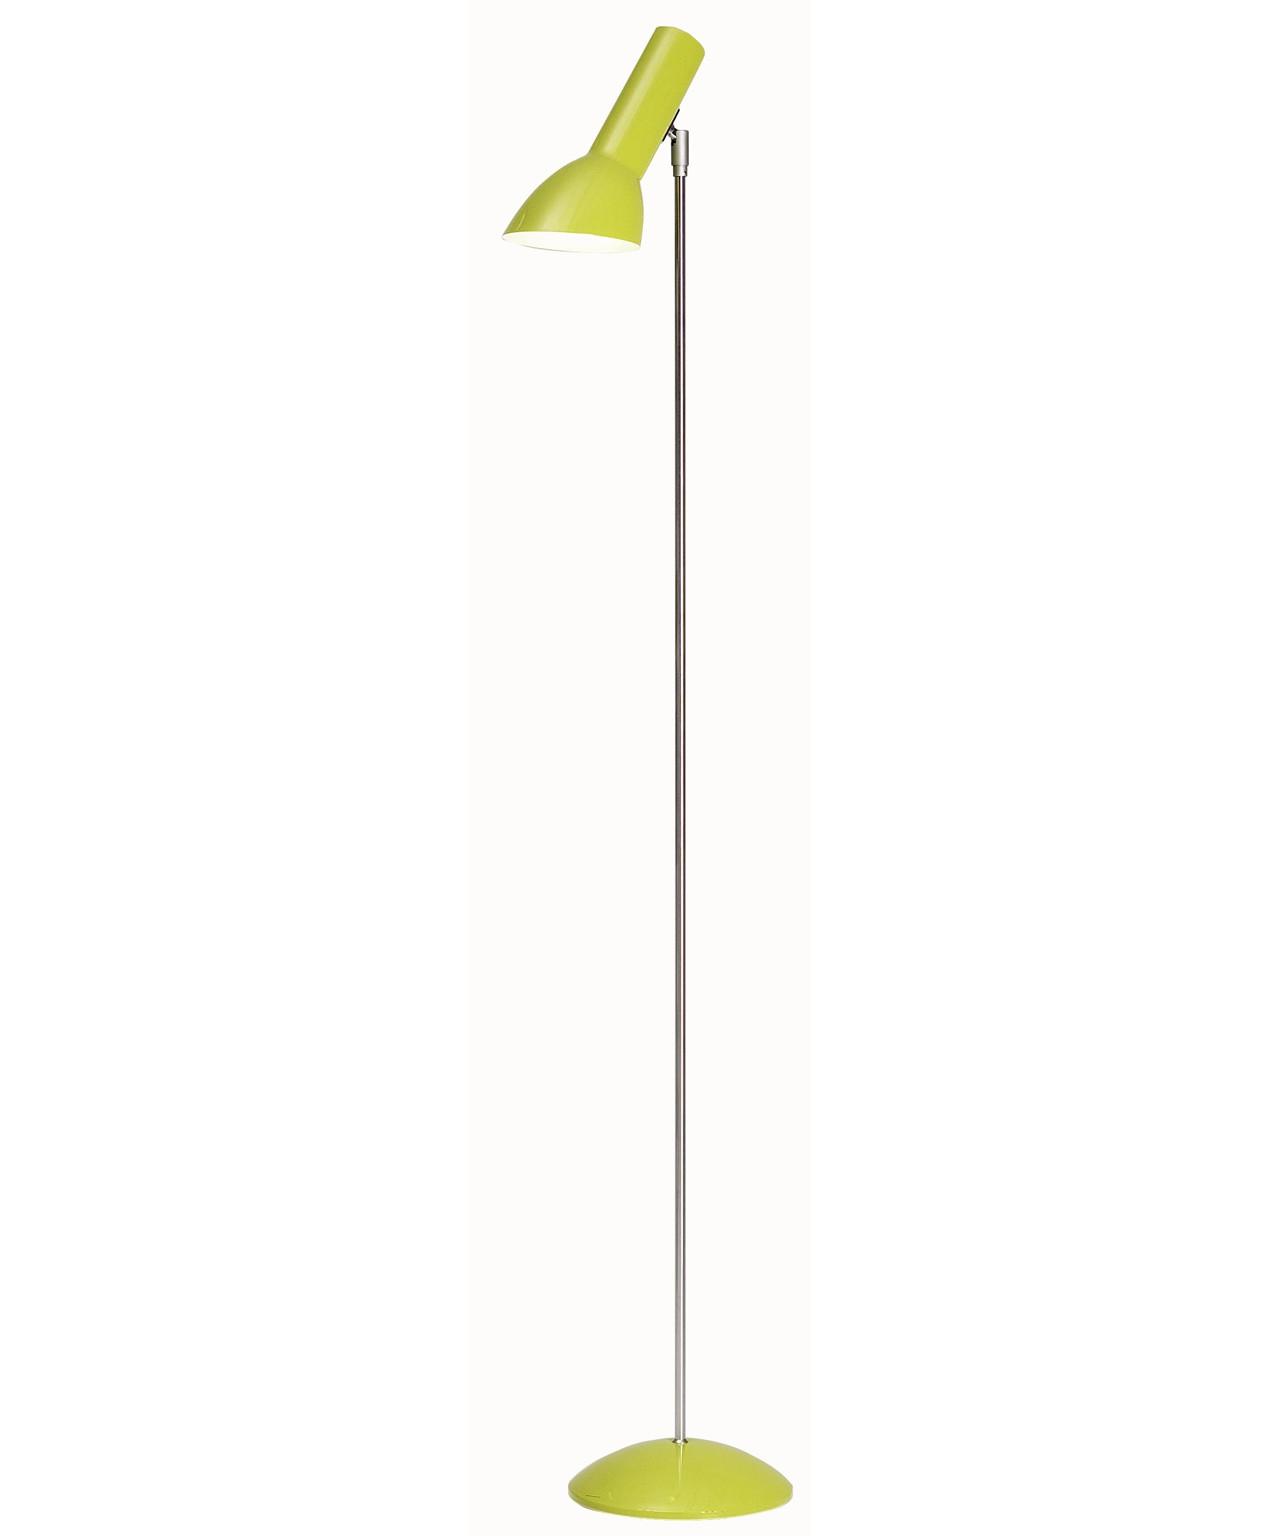 Image of   Oblique Gulvlampe Gul Højglans - CPH Lighting